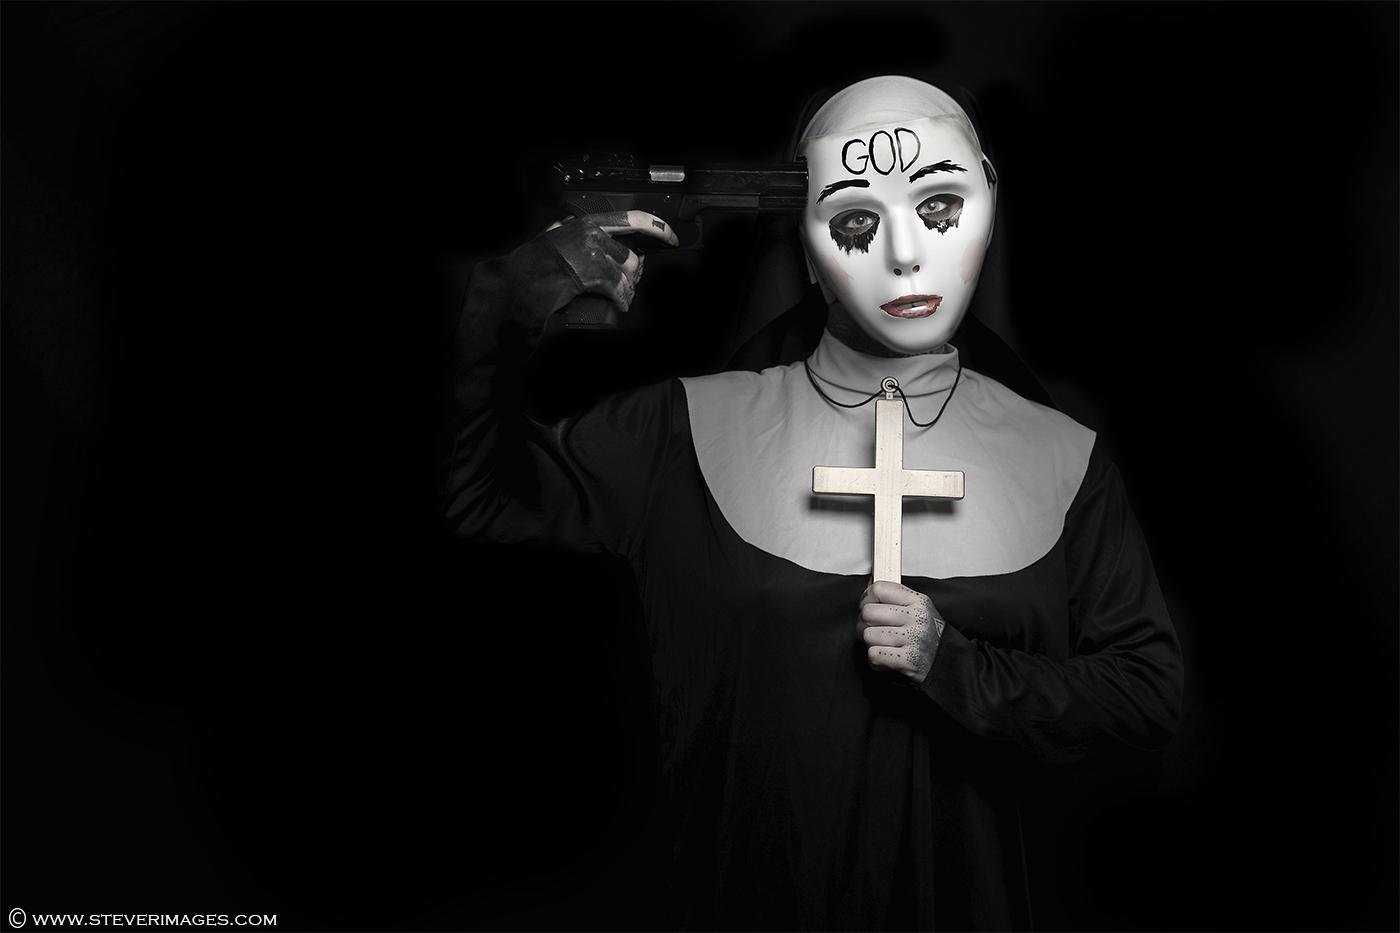 Suicide, mental health, gun, nun, female model, subdued colour, photo